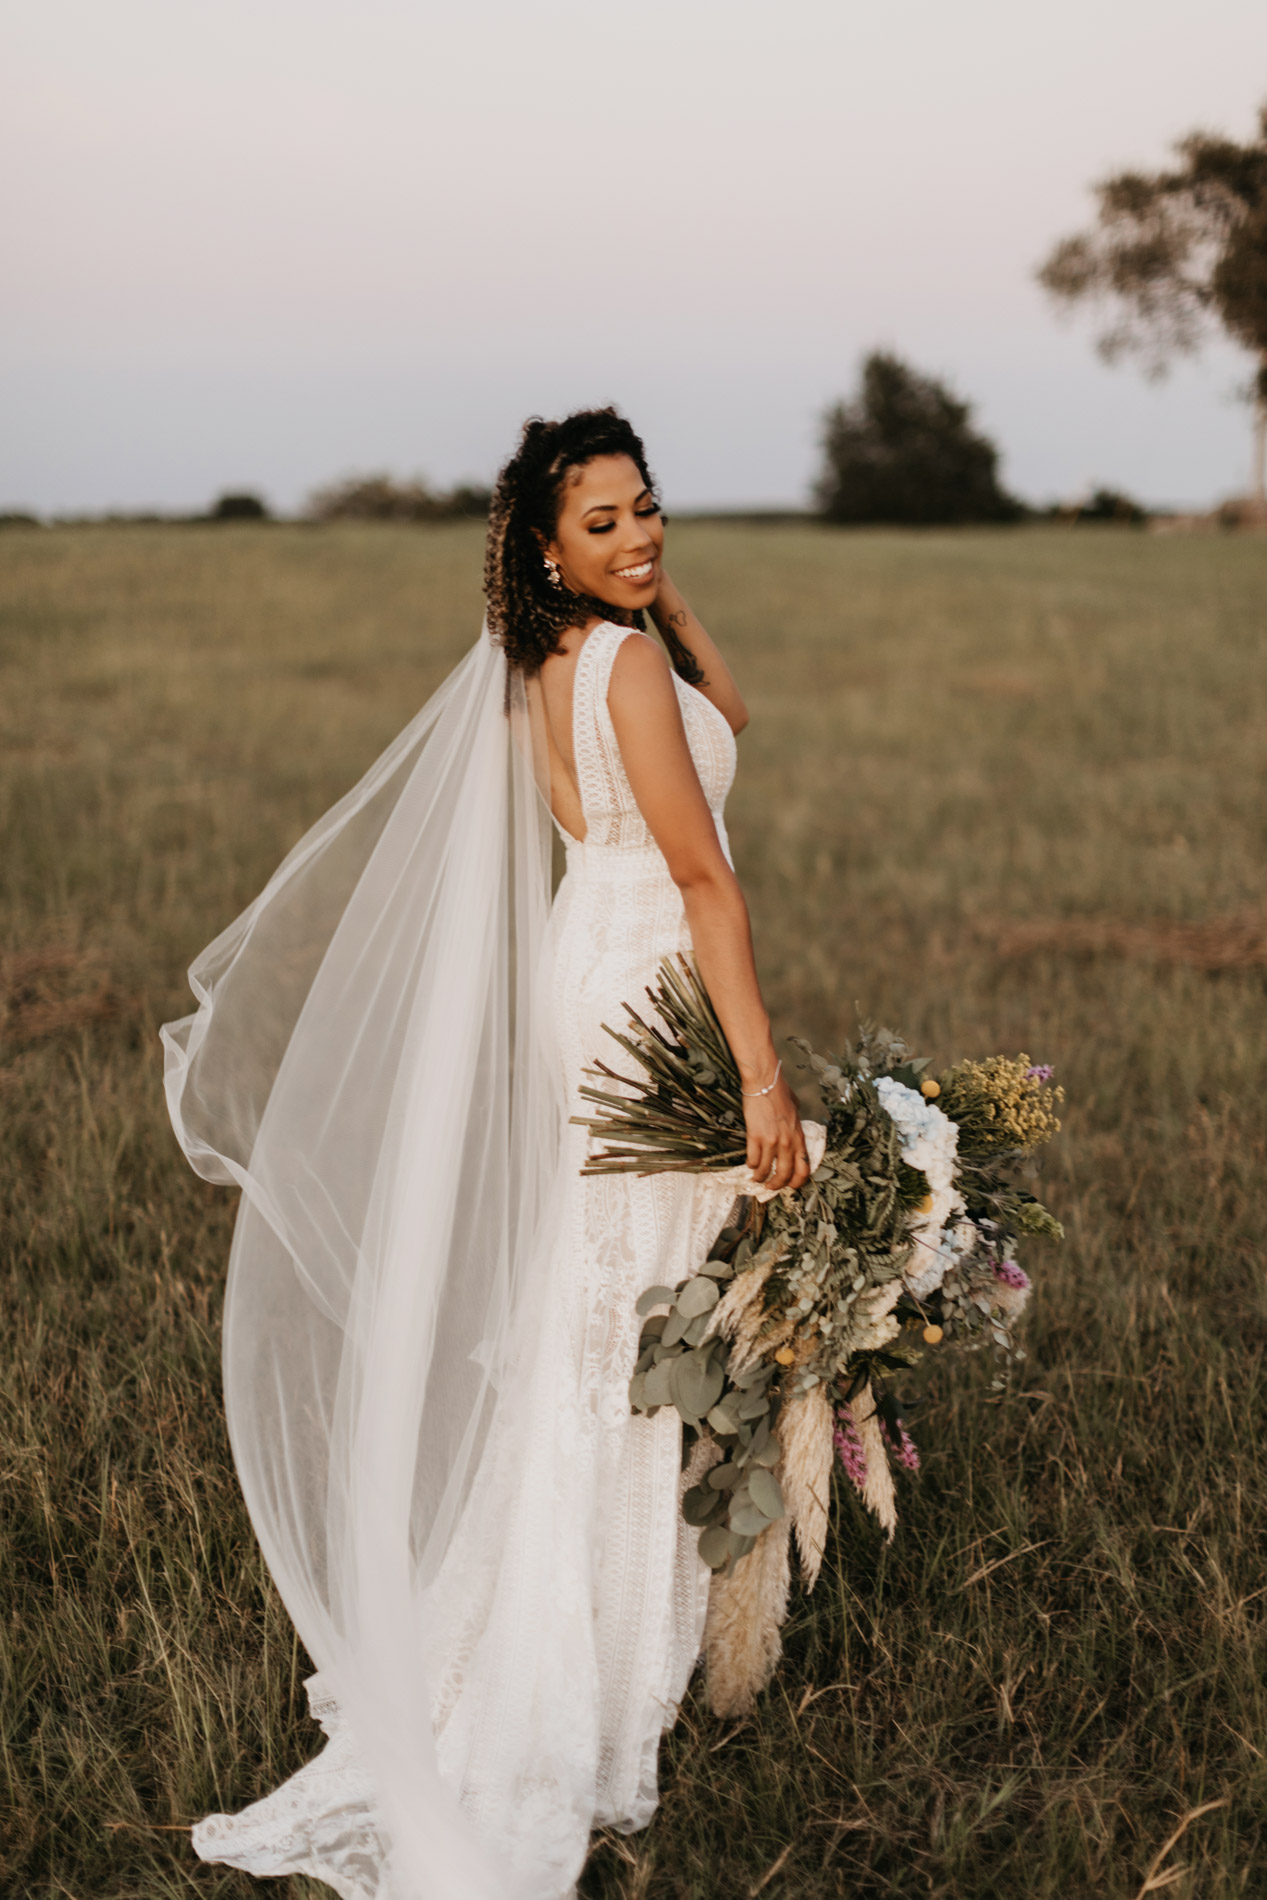 Bride posing for wedding photos on her wedding day